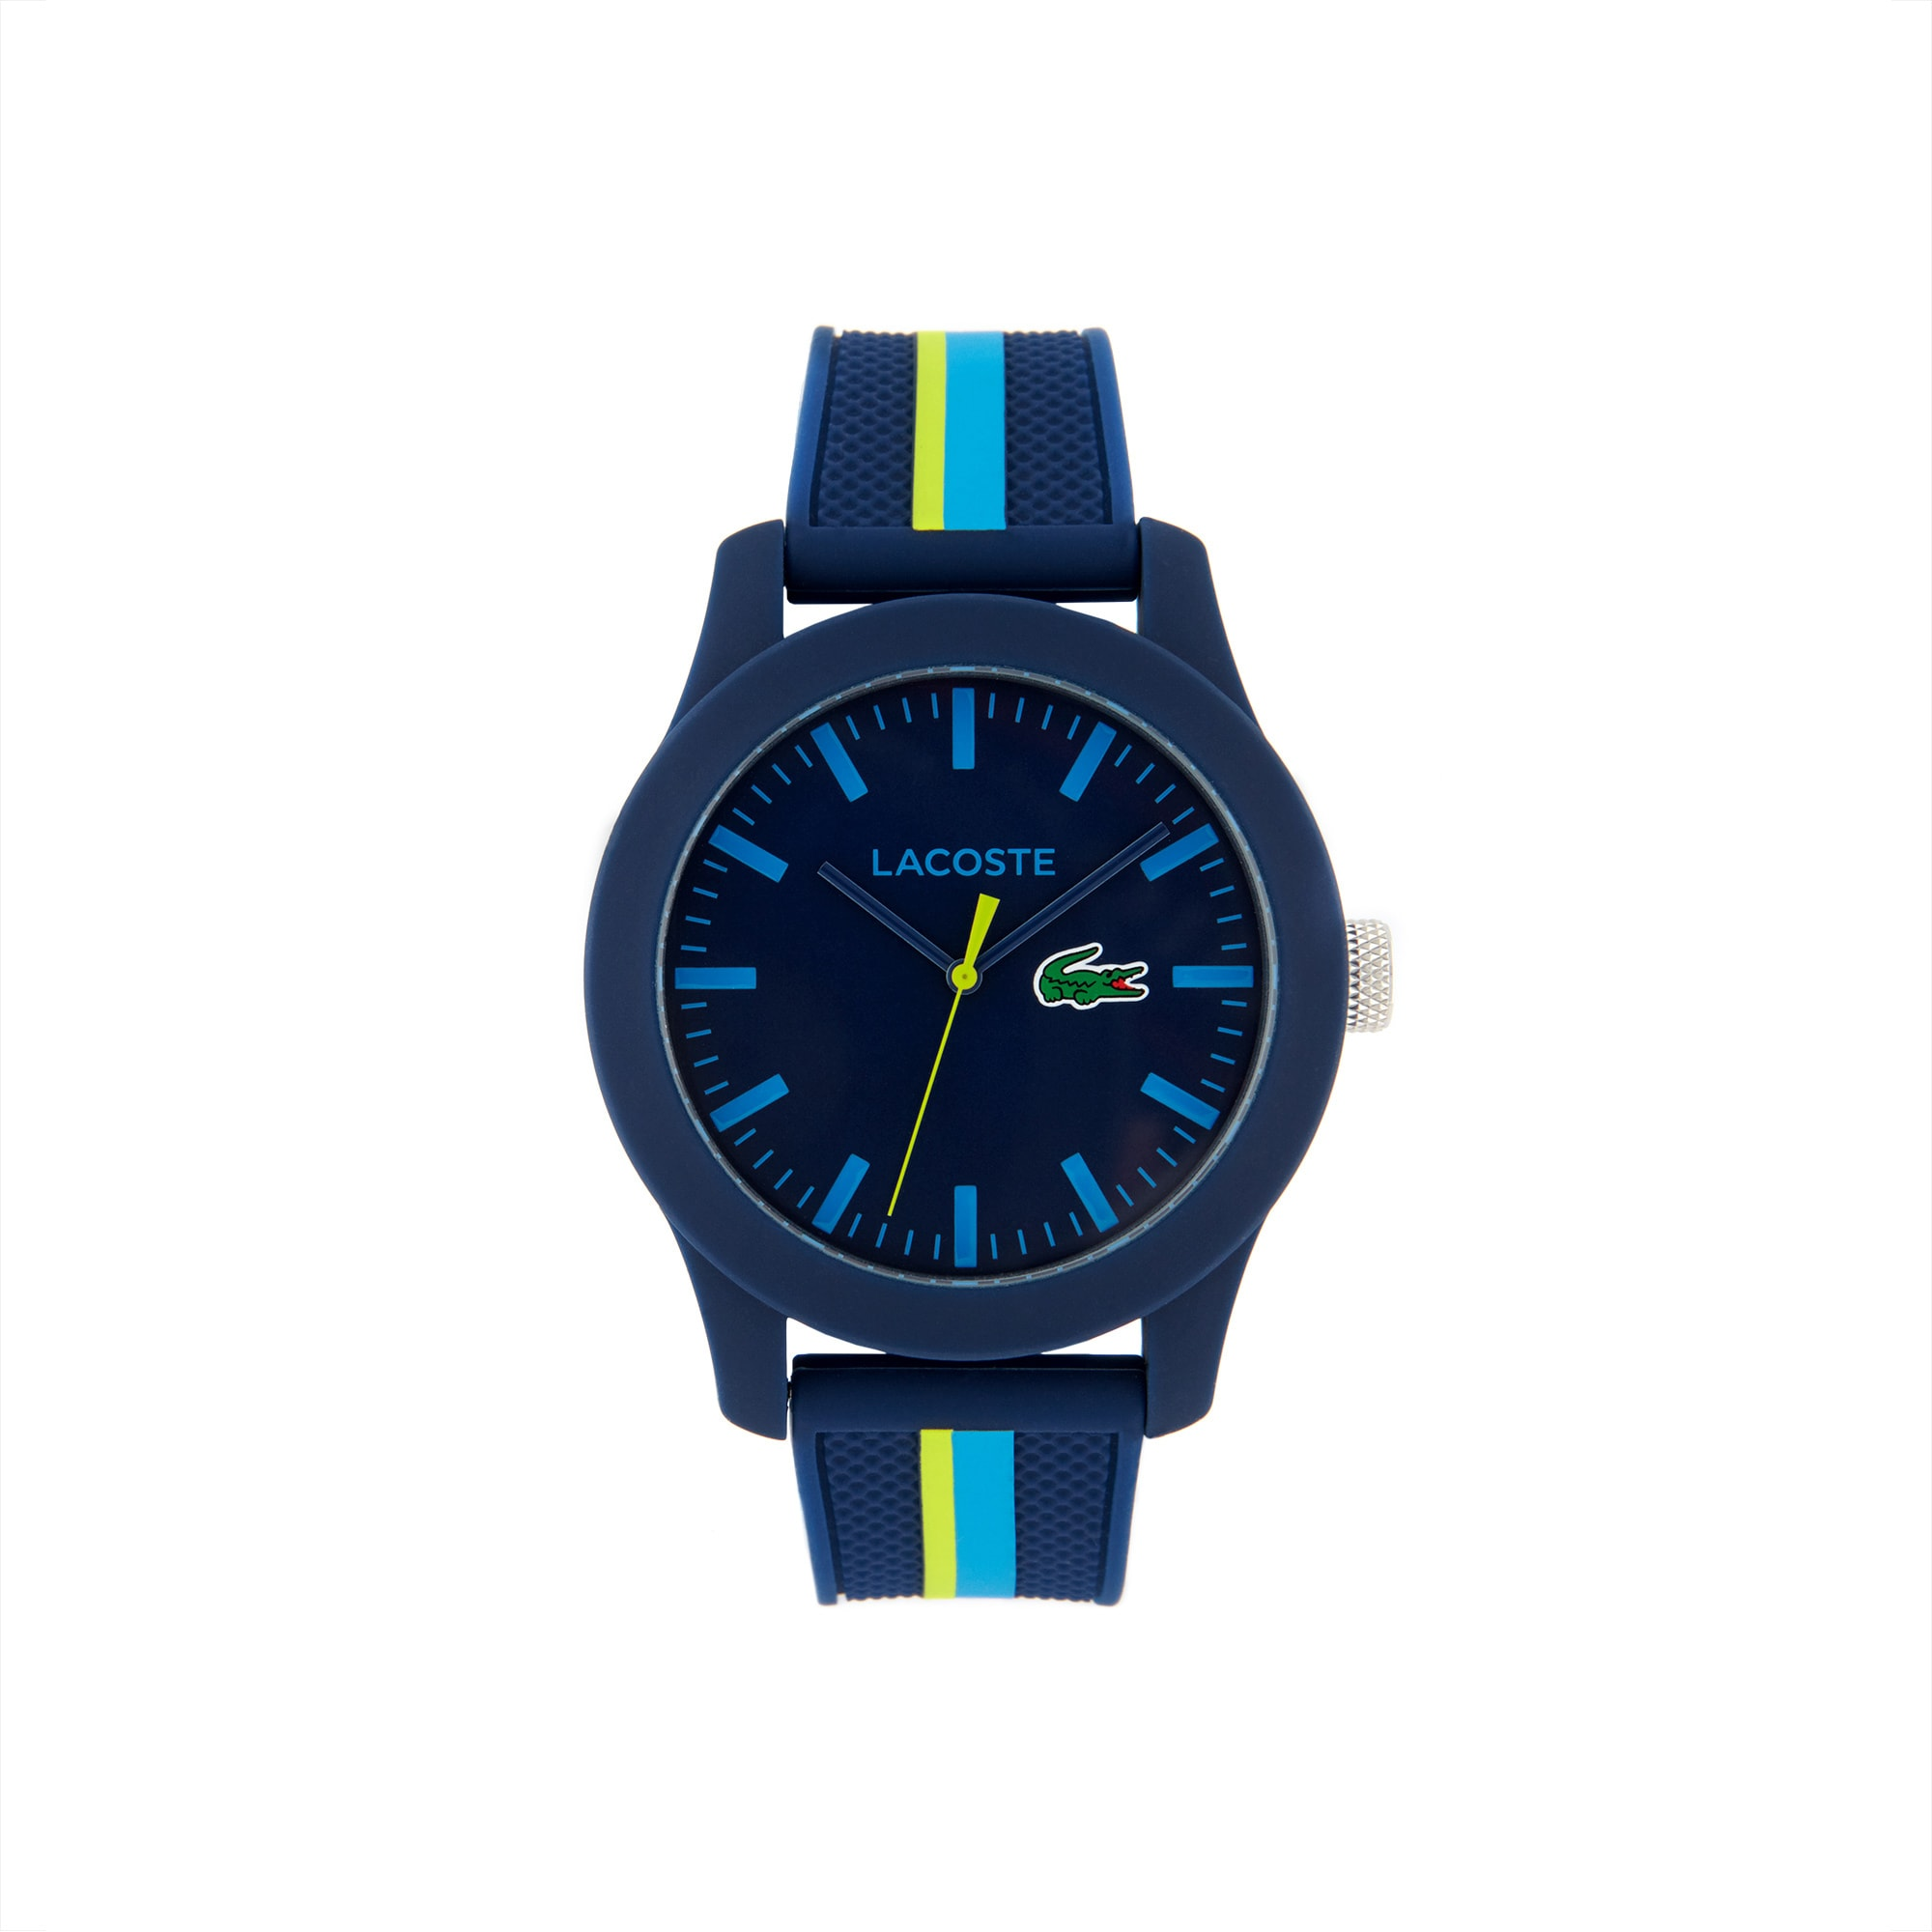 Men Lacoste 12.12 Holiday Horloge met Blauwen Siliconen Armband